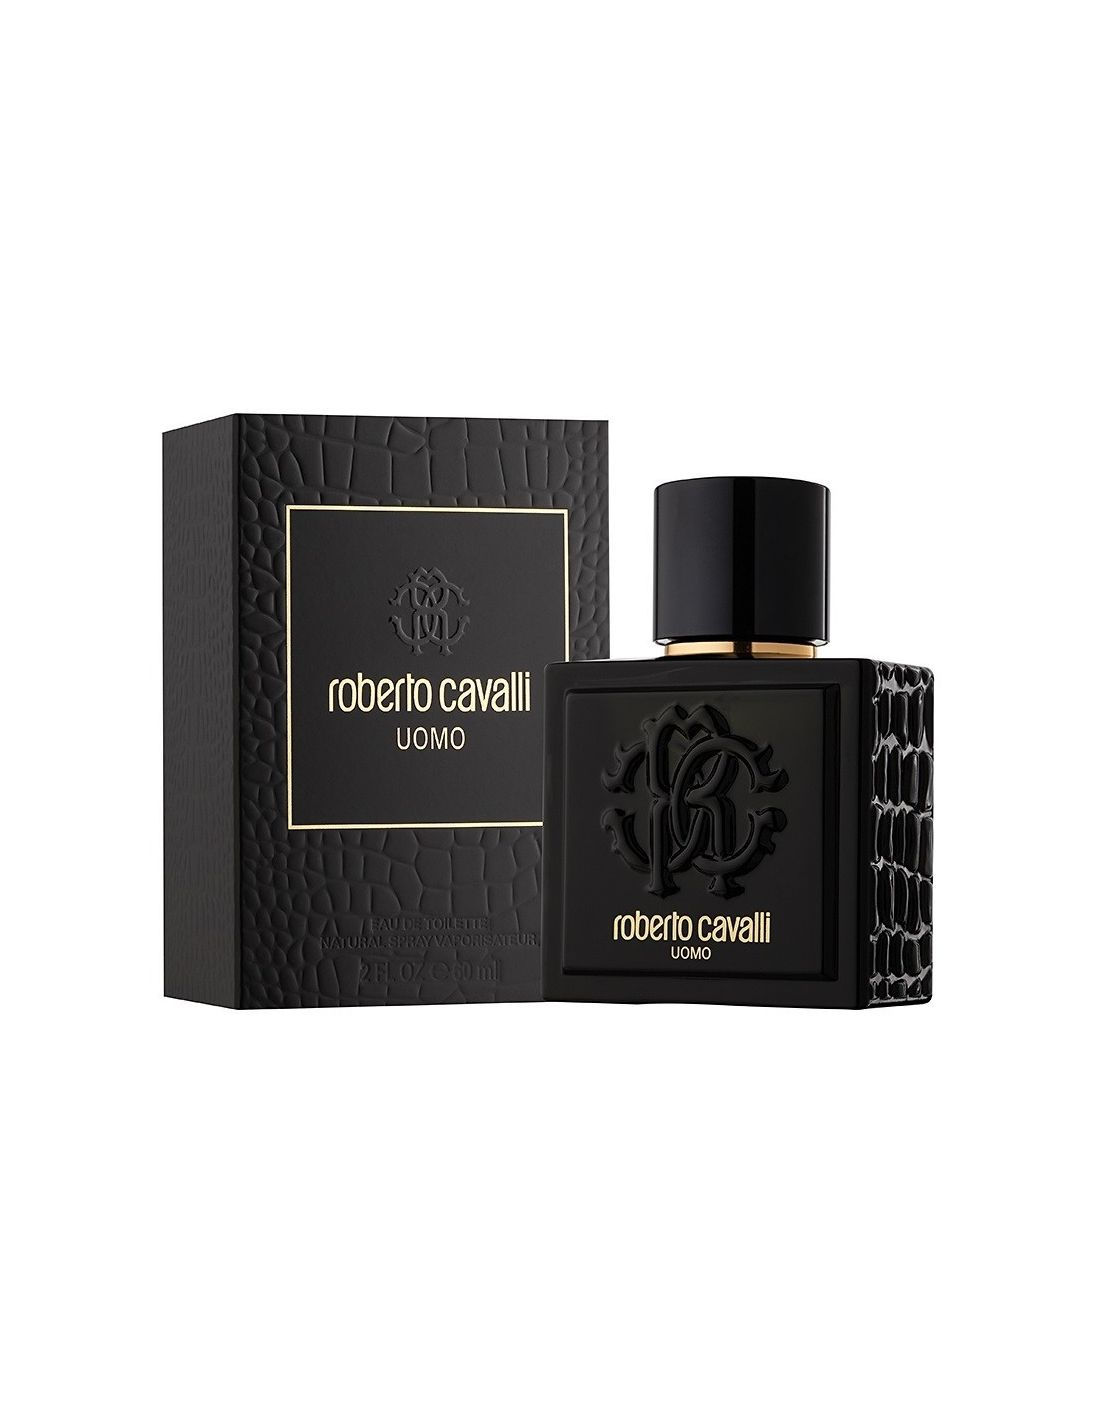 Roberto Cavalli Uomo Eau de Toilette 100 ml na Perfumes 24 online 16a13332e38